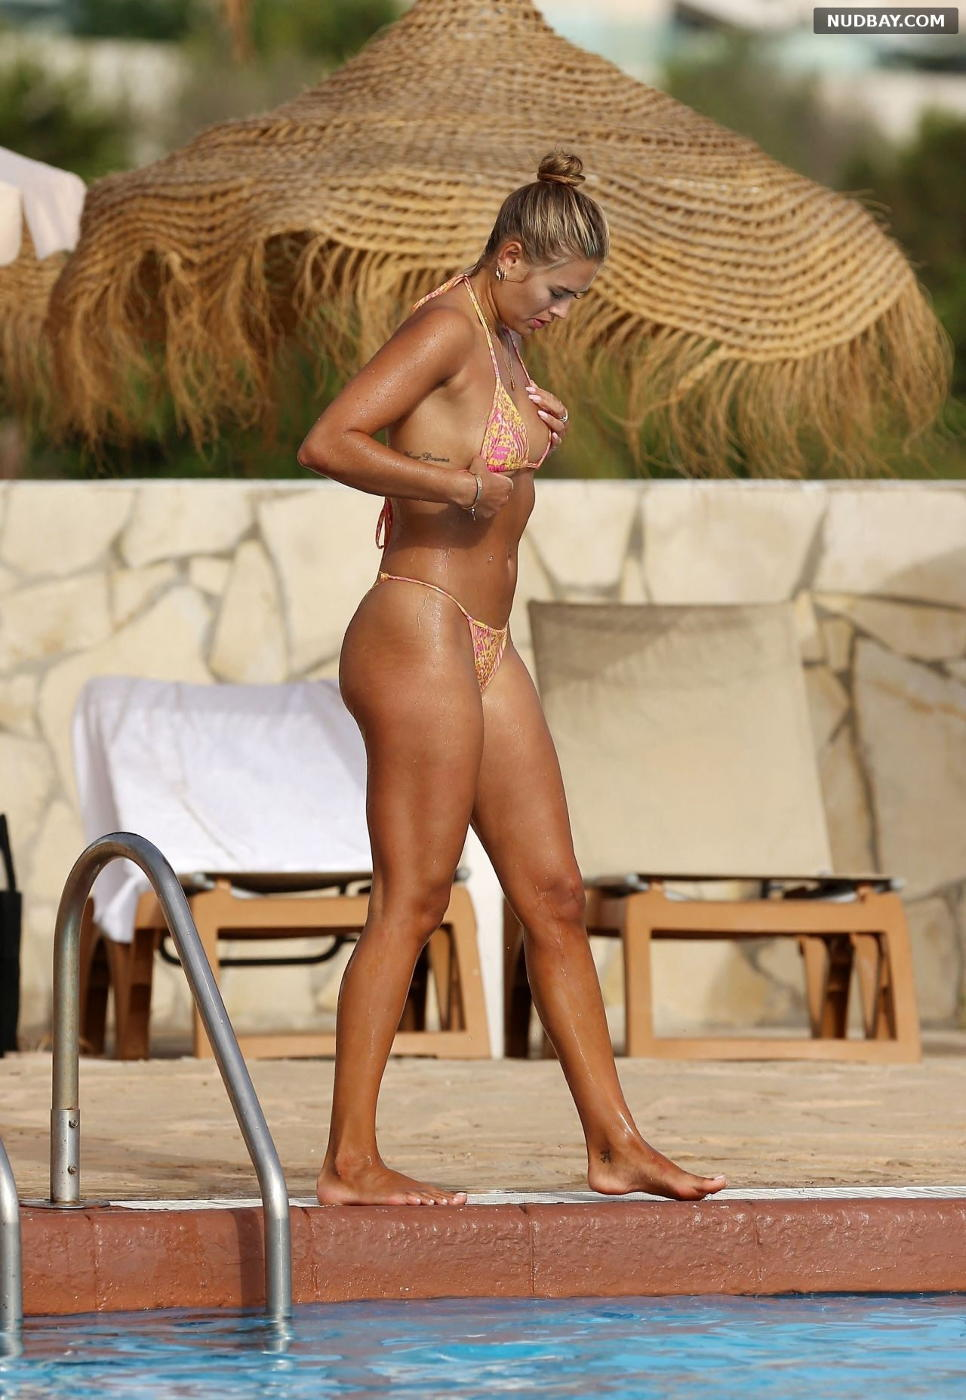 Arabella Chi sexy at a Pool on Holiday in Ibiza July 15 2021